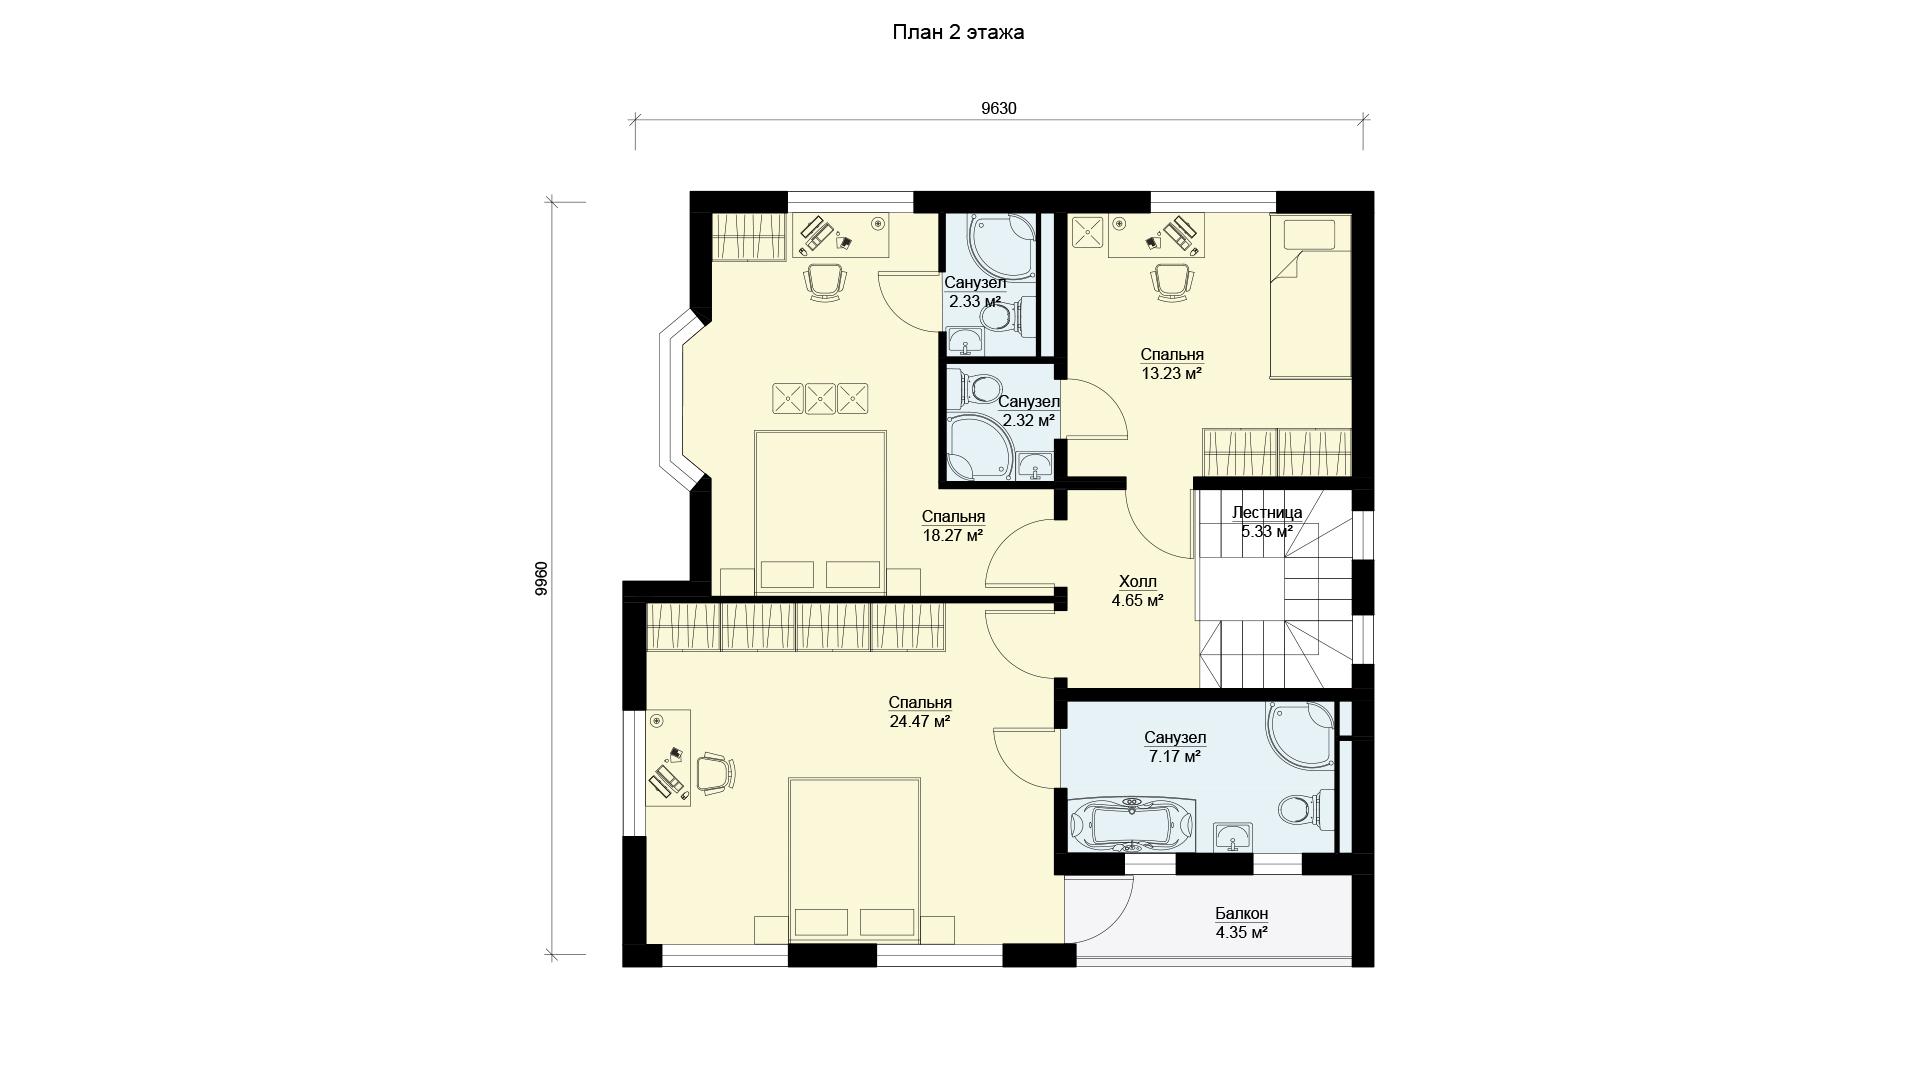 План второго этажа двухэтажного дома, проект БЭНПАН МС-160.